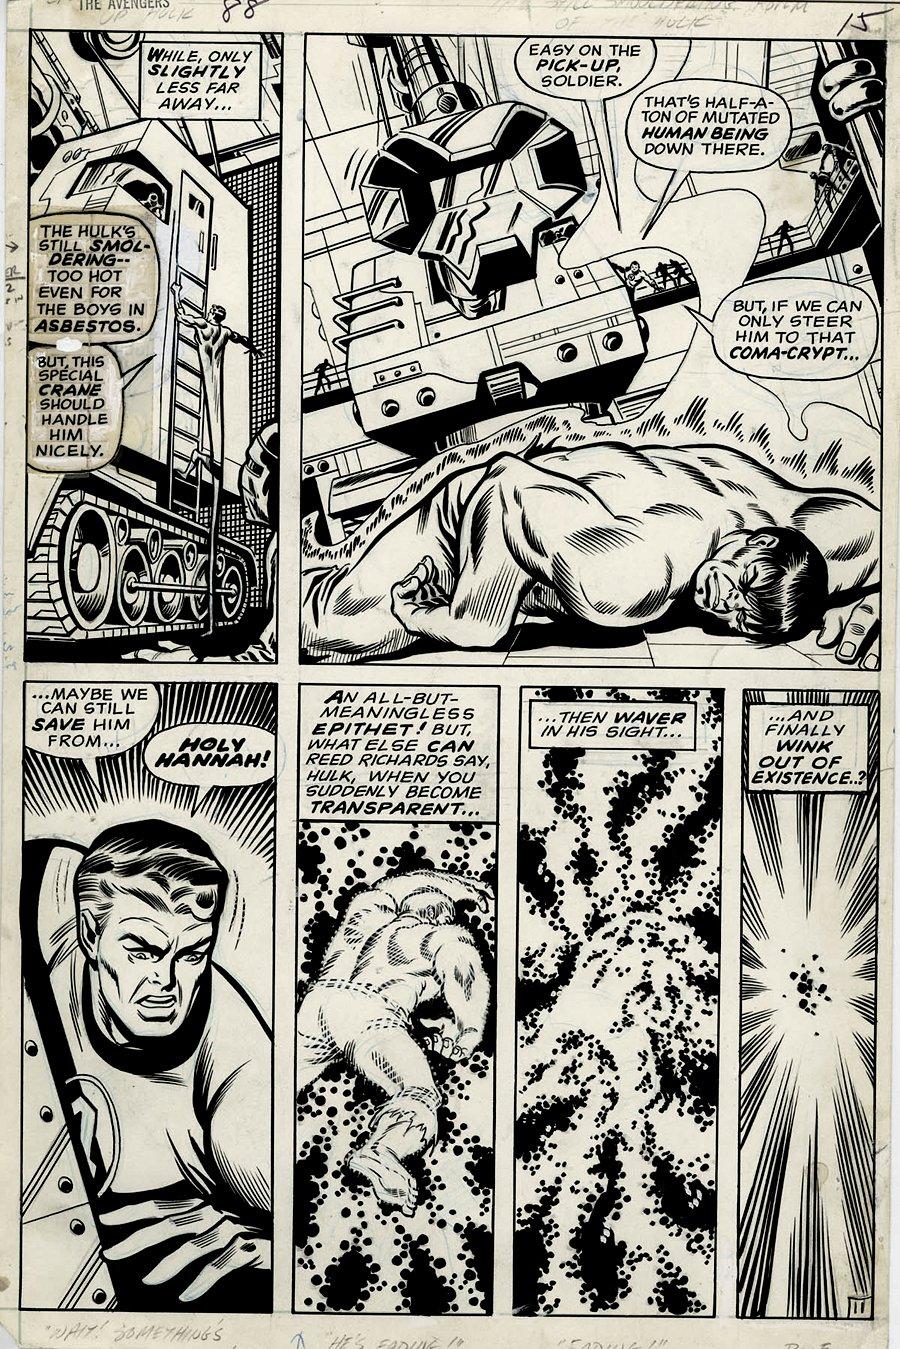 Avengers #88 p 11 (1970)